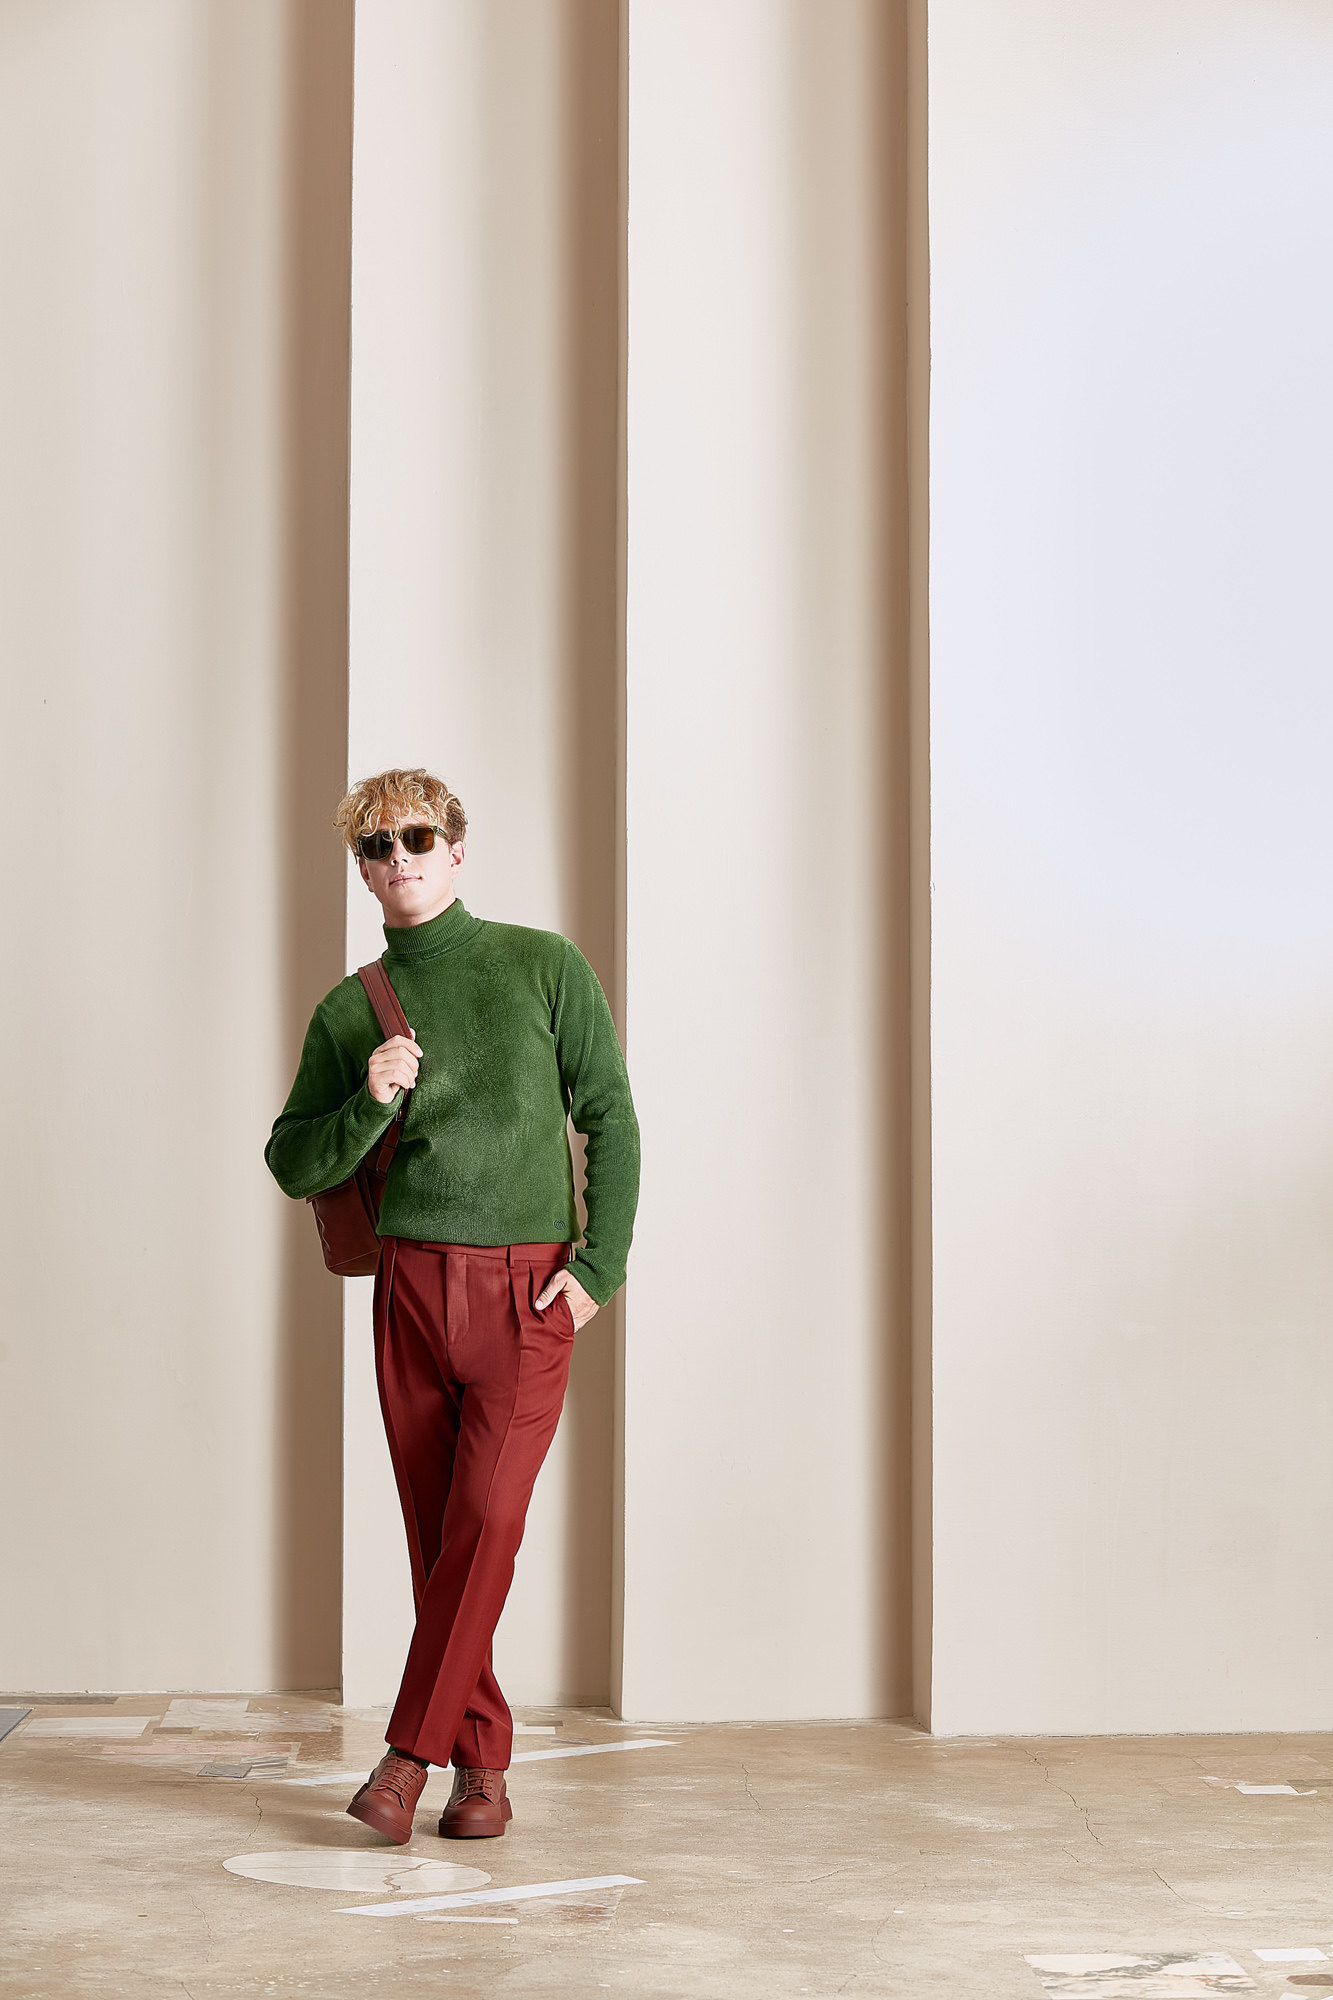 Очки Emporio ArmaniВодолазка Dior MenРюкзак Brunello CucinelliБрюки BossКеды Boss